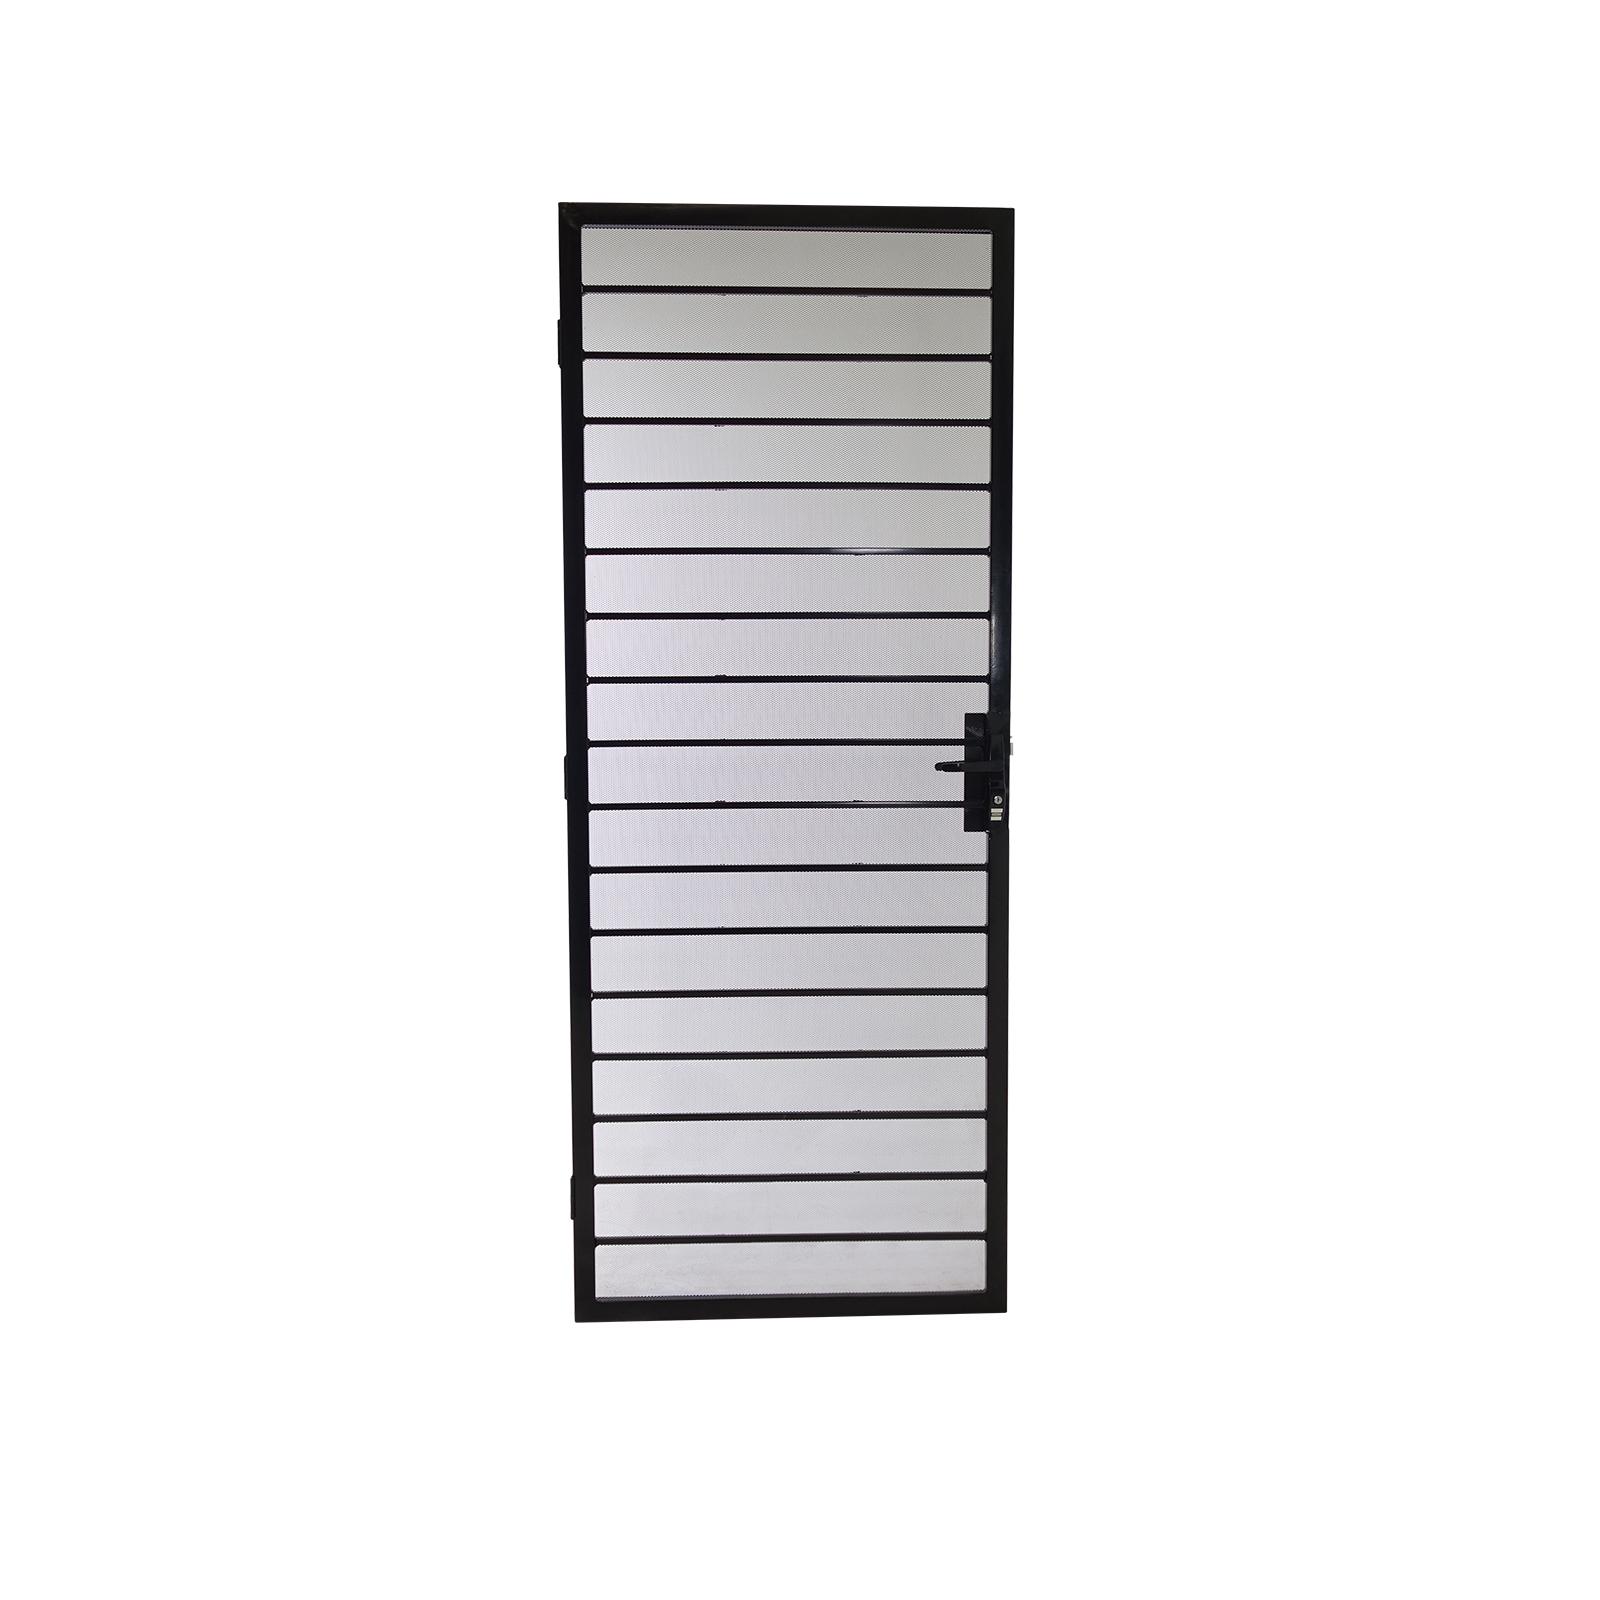 Polar 2024 x 806mm Black Hamilton Imperial Steel Screen Door